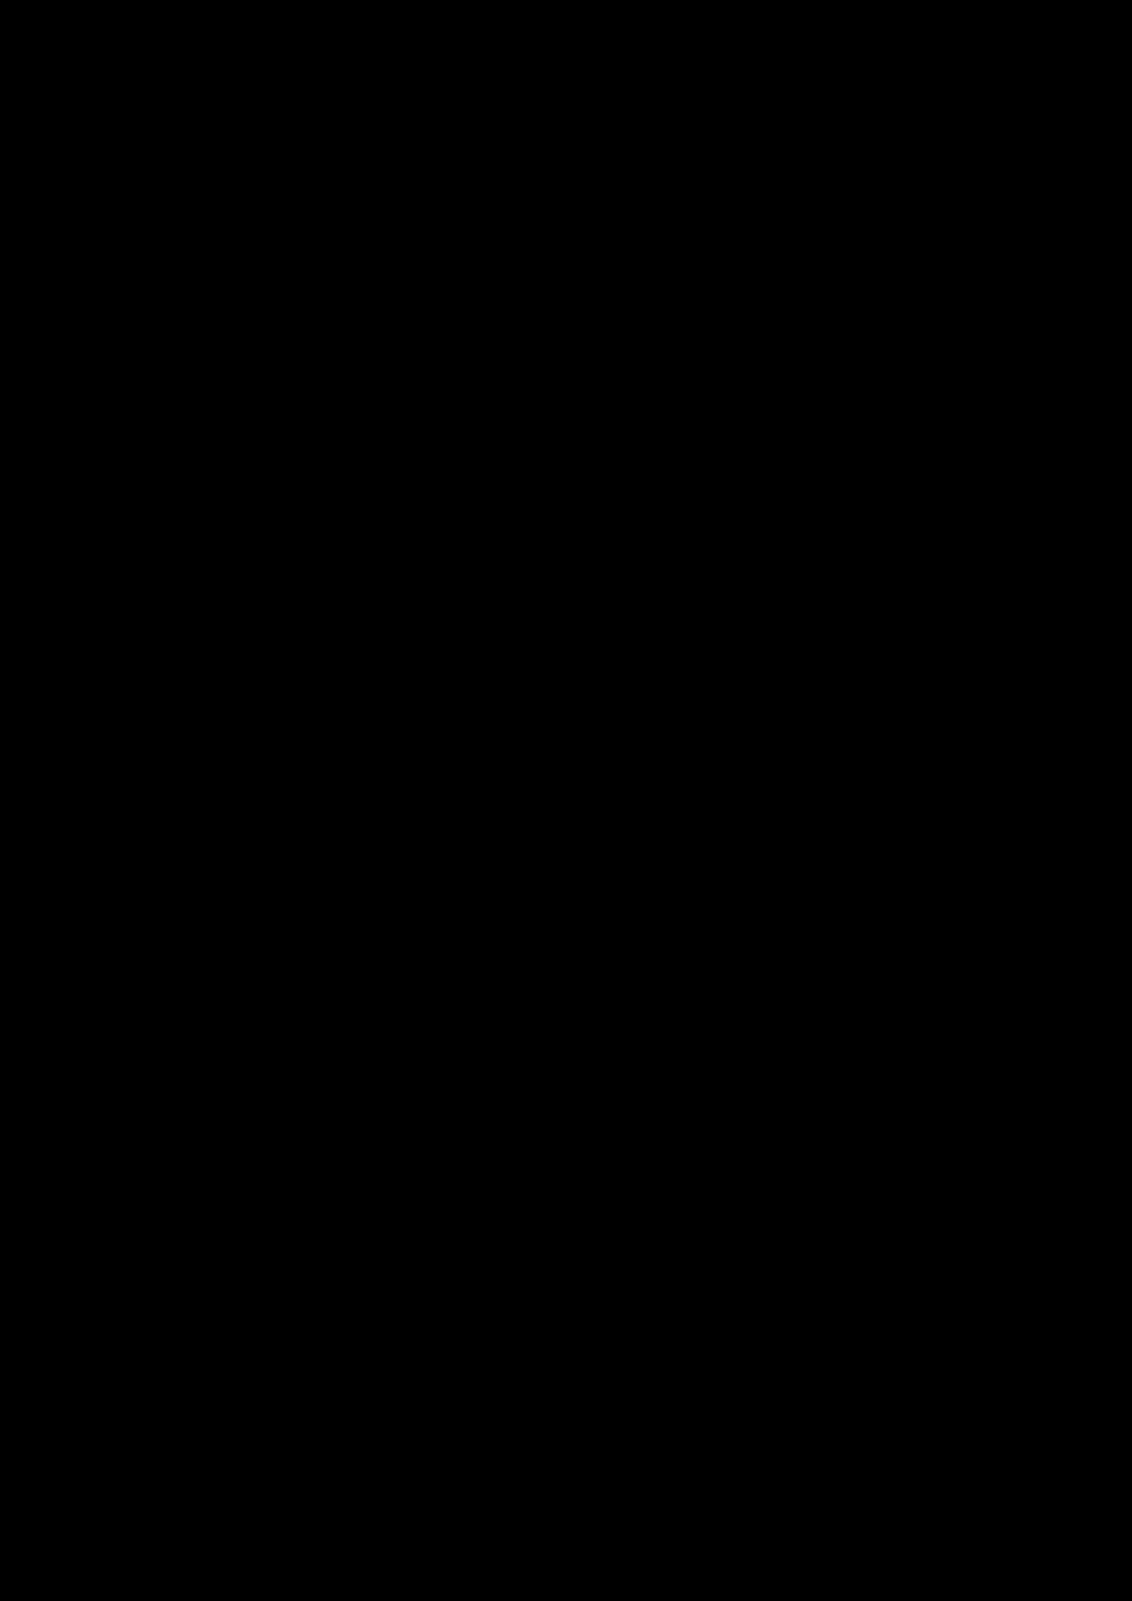 Ispoved Pervogo Boga slide, Image 11